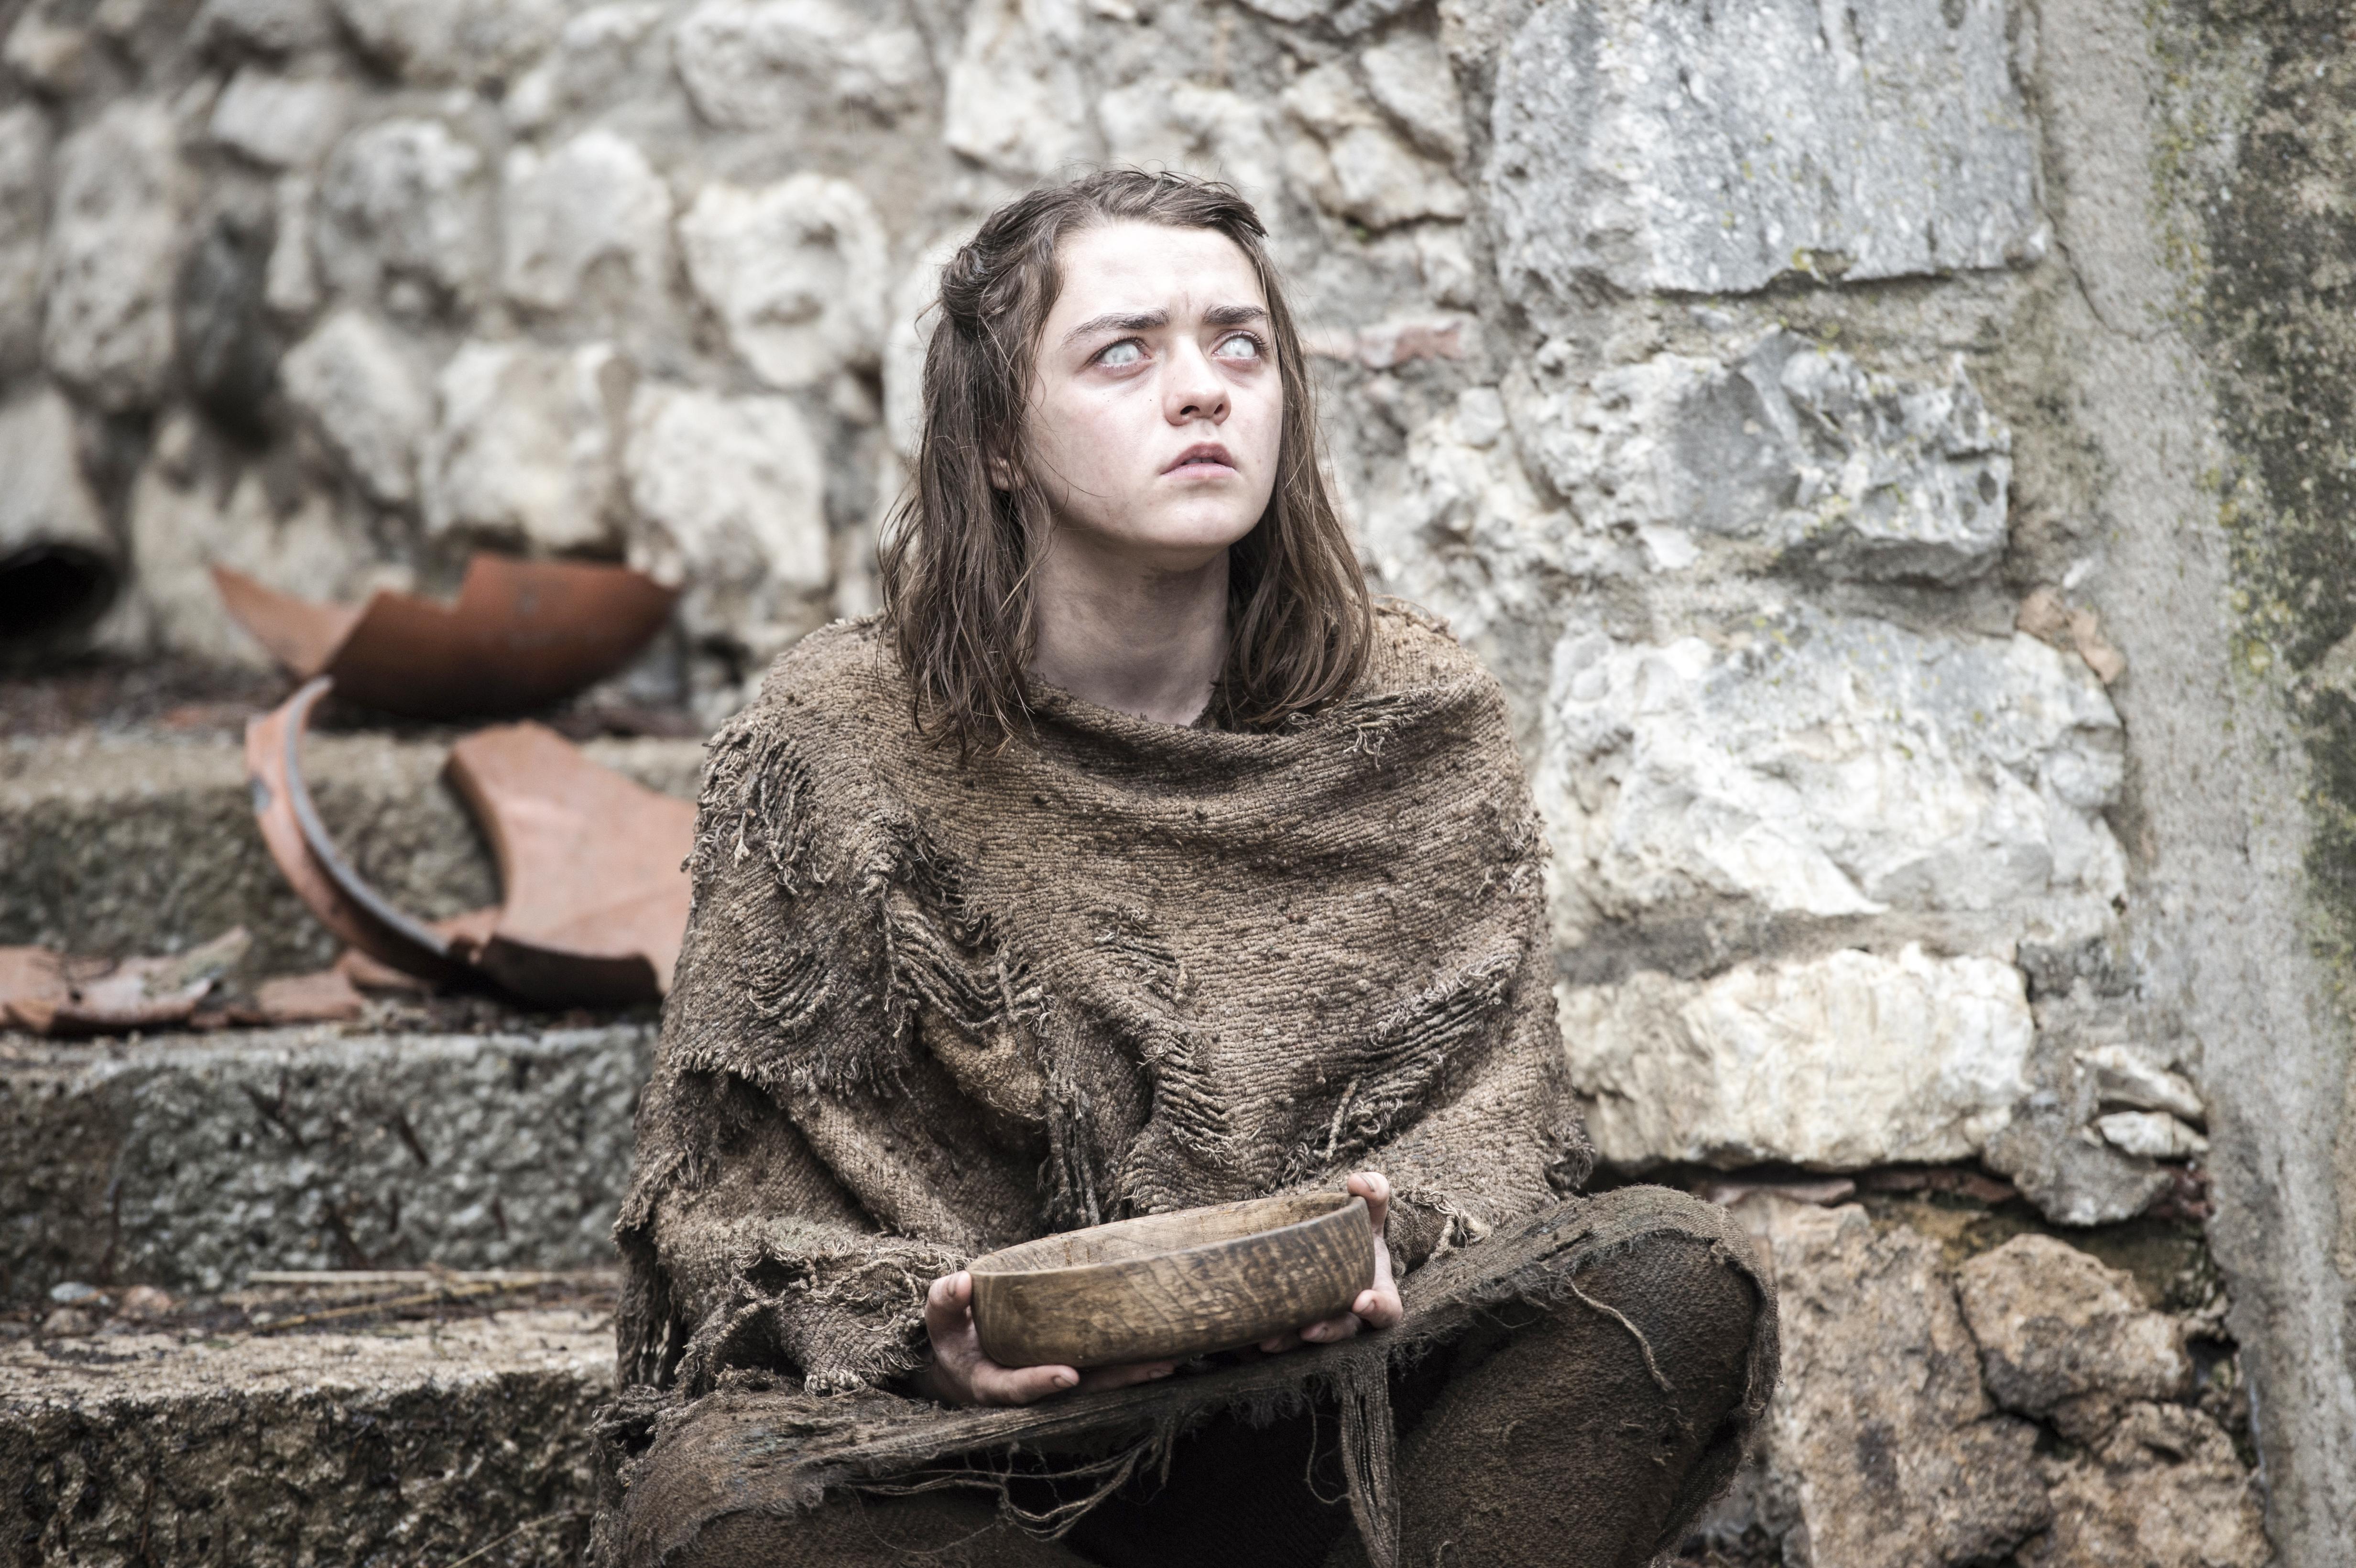 Maisie Williams as Arya Stark. Photo by Macall B. Polay/HBO